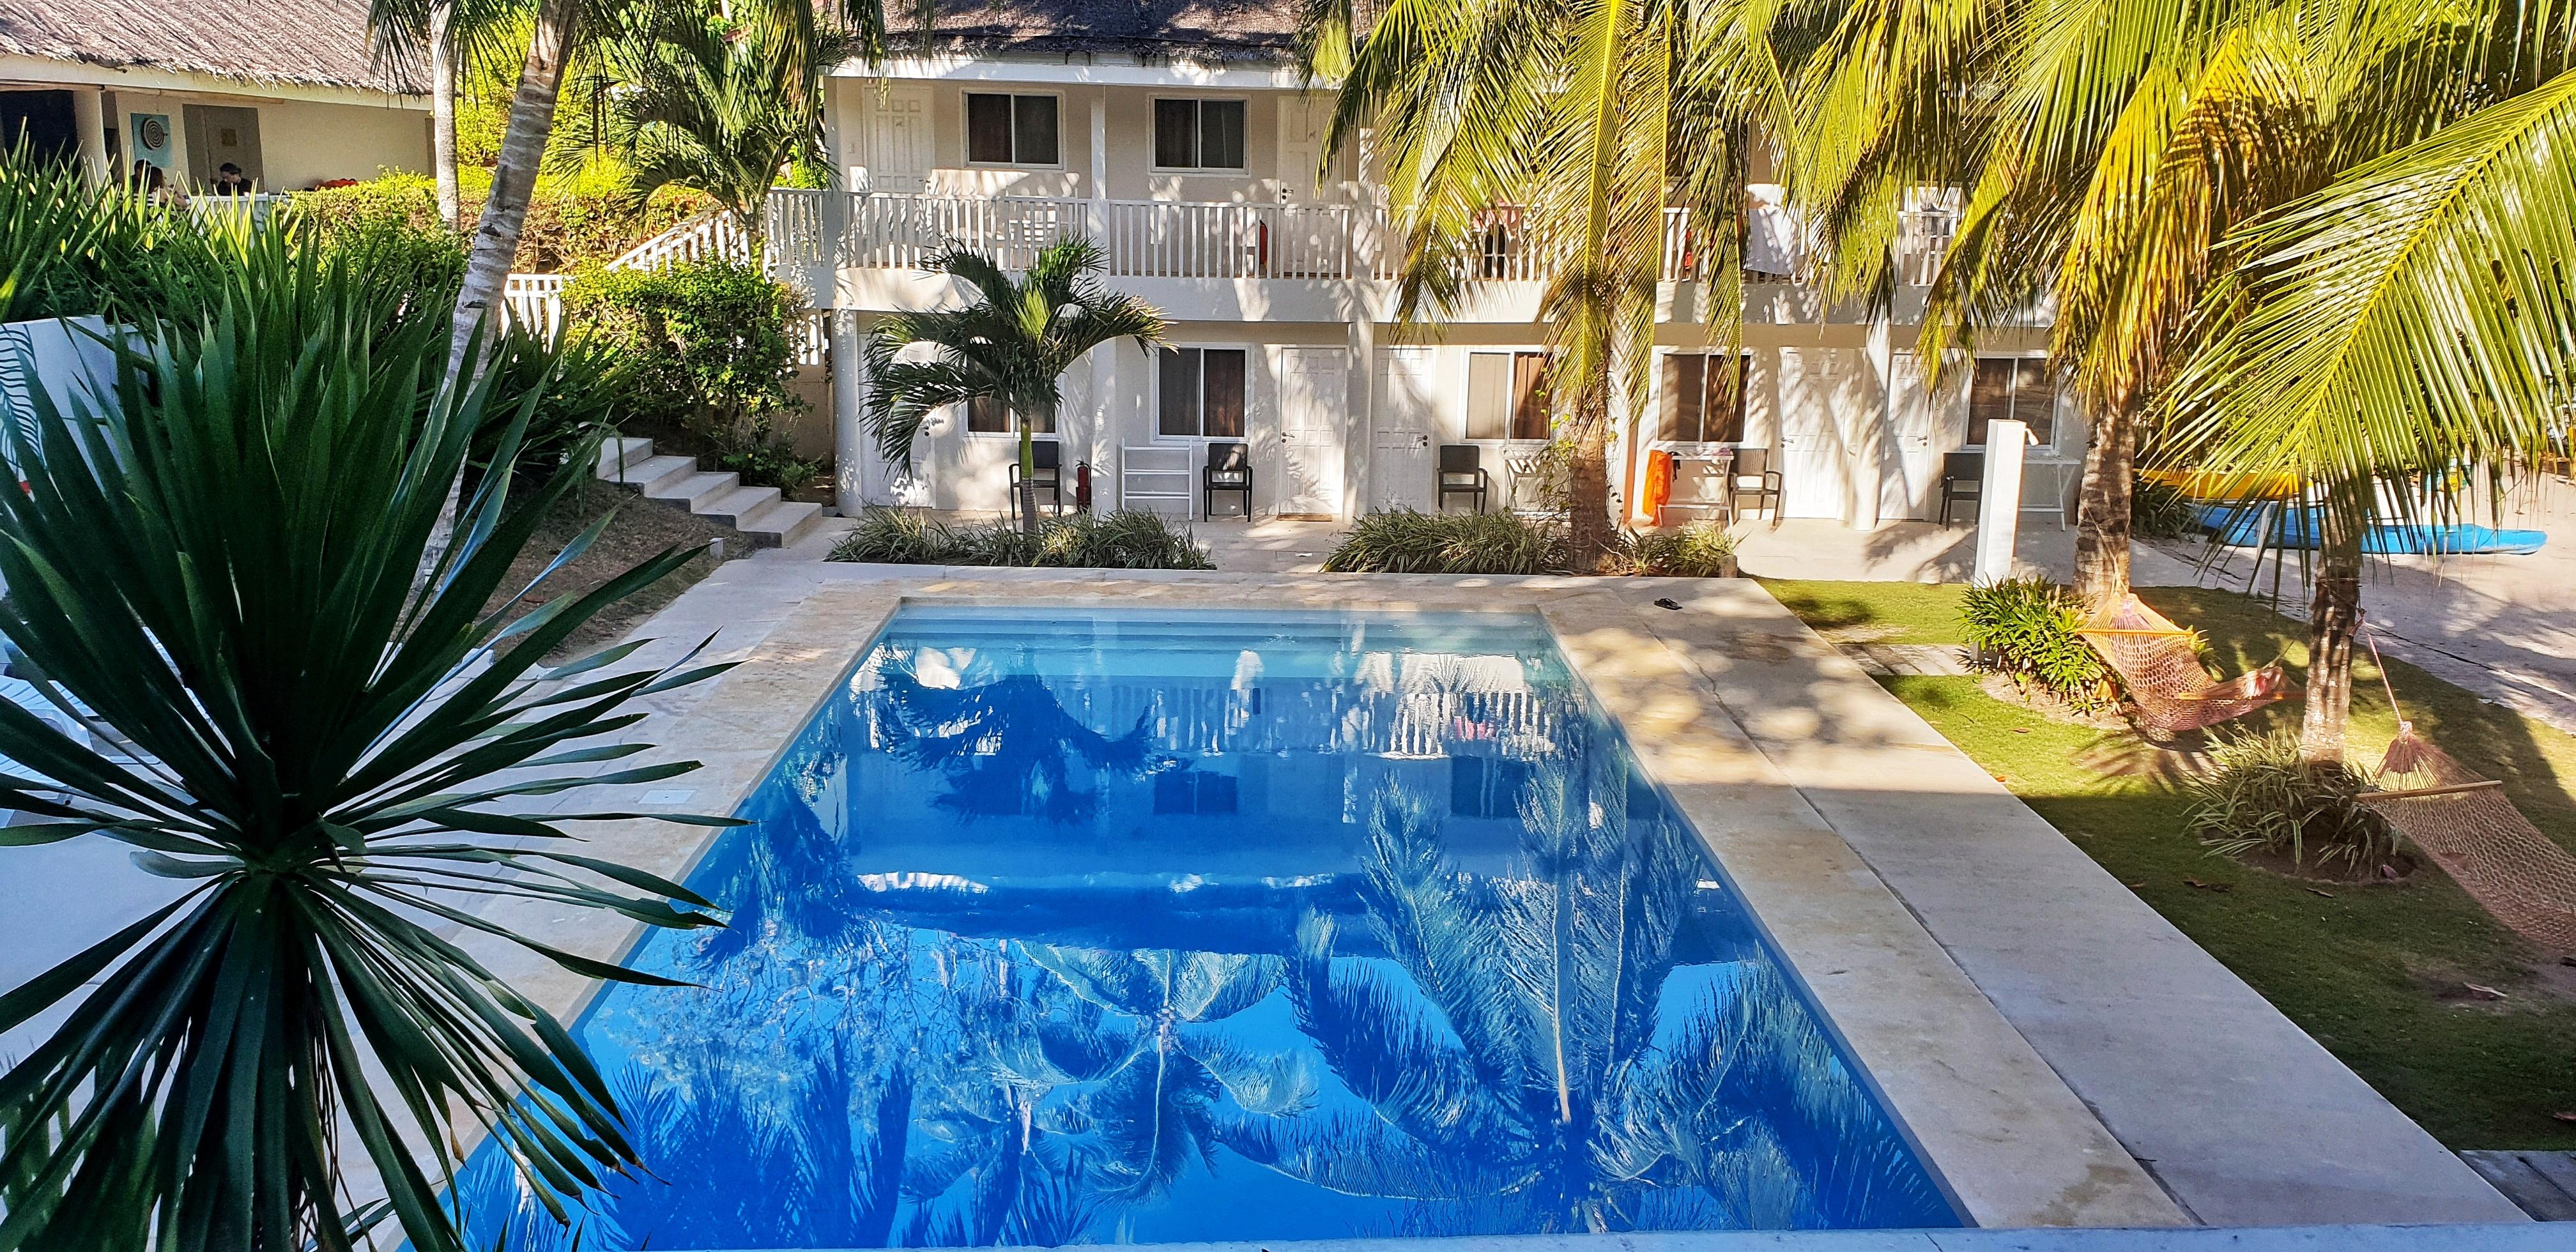 Momo Beach House Room and Pool, Bohol, Philippines